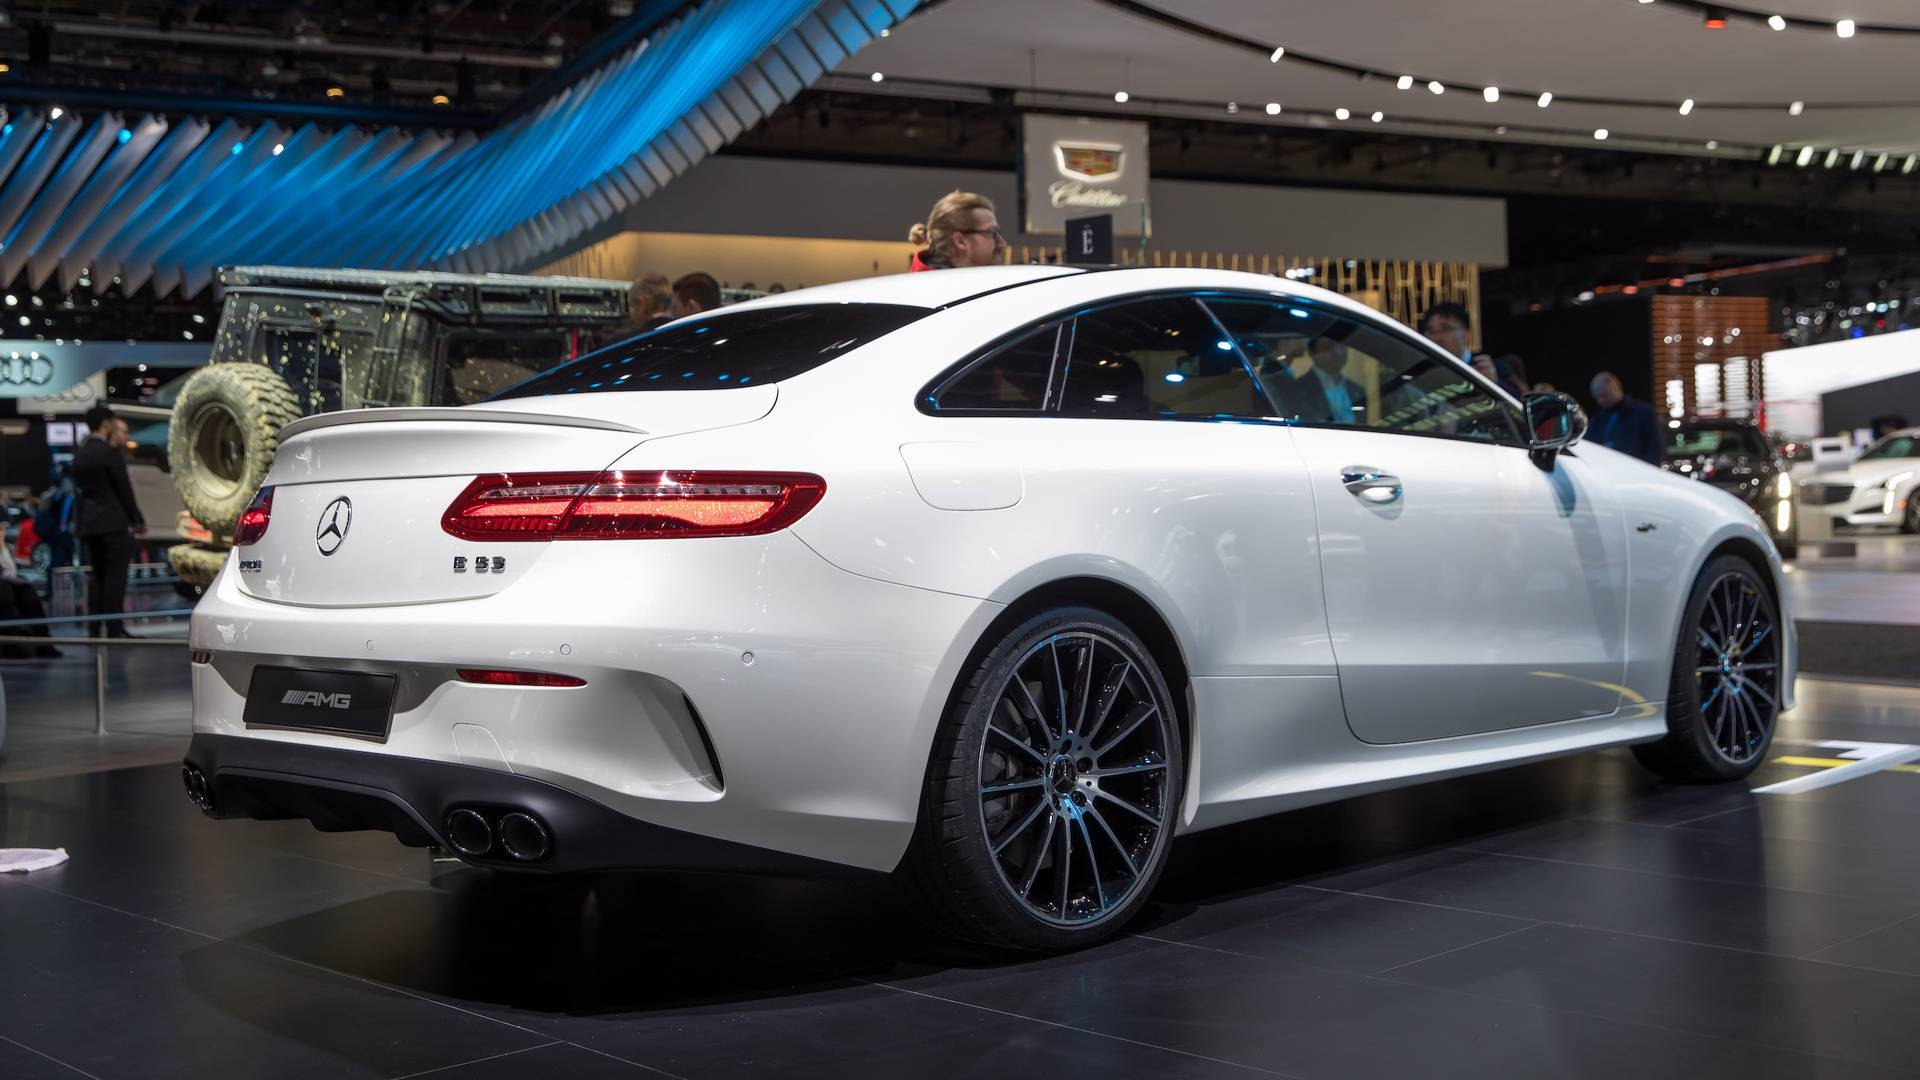 Mercedes-AMG 53車系的陣容日漸齊全,那麼最討喜的AMG C53呢?|InCar癮車報 | 癮車報